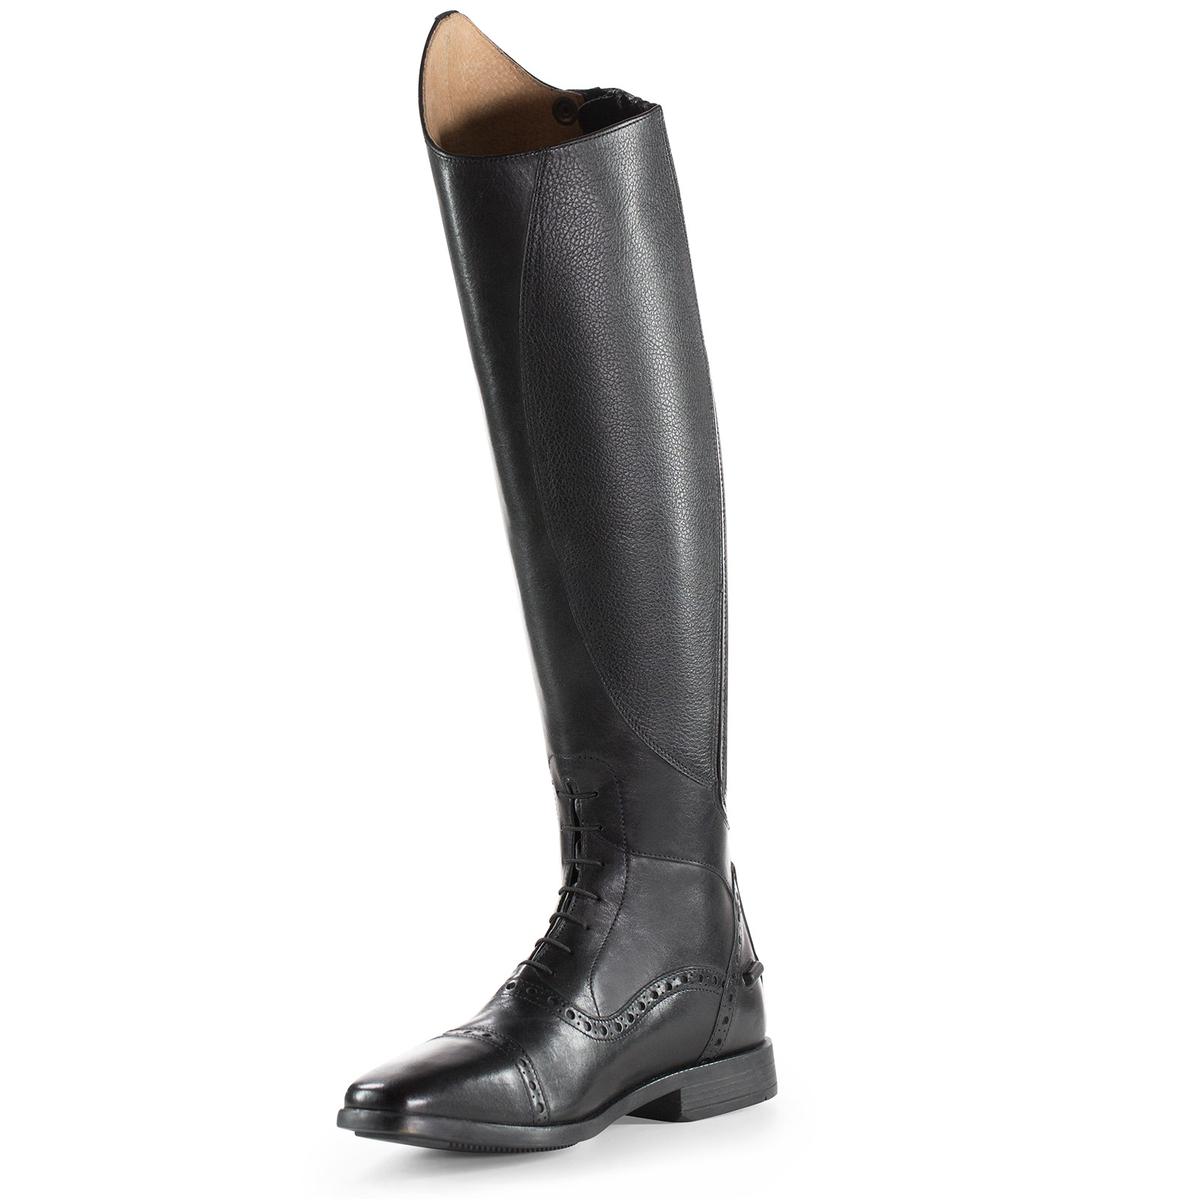 Horze Winslow Field Tall Boots | Horze